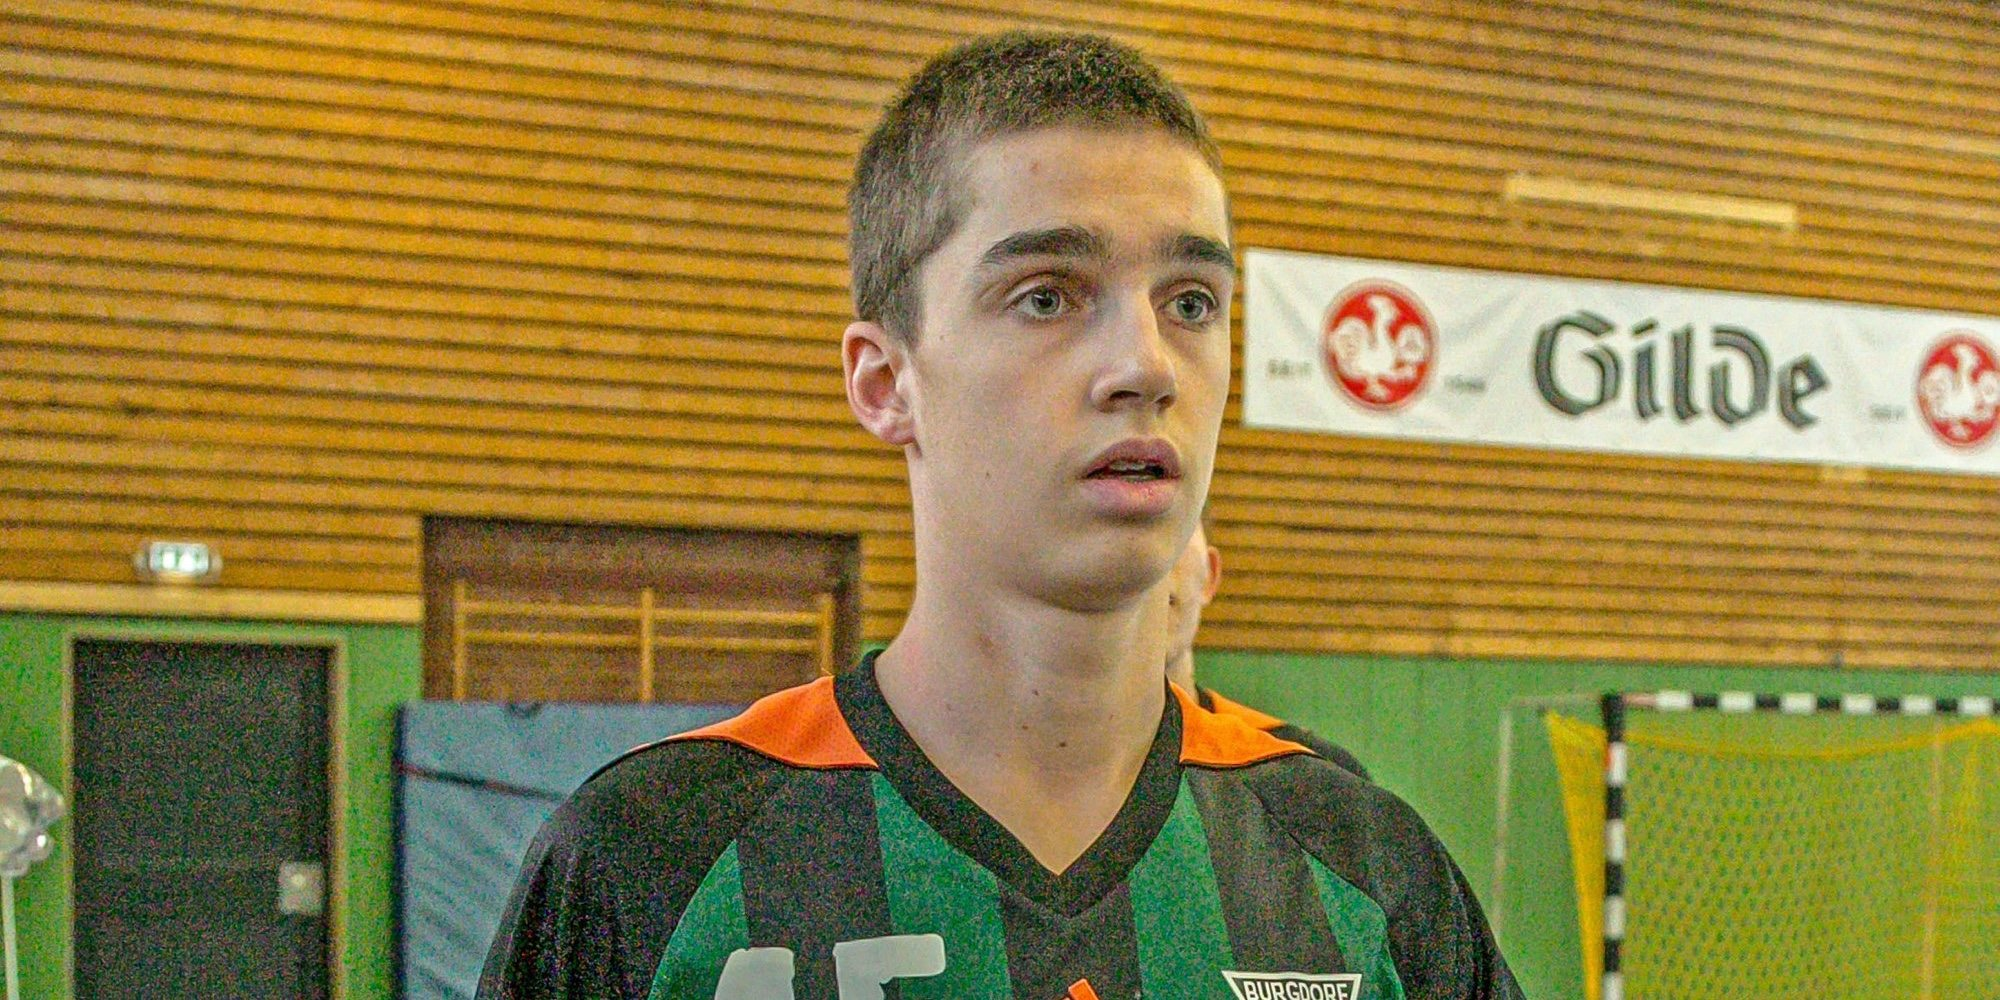 Pablo Urdangarin se enfrenta a Álex Rubiño, hijo del antiguo rival de Iñaki Urdangarin